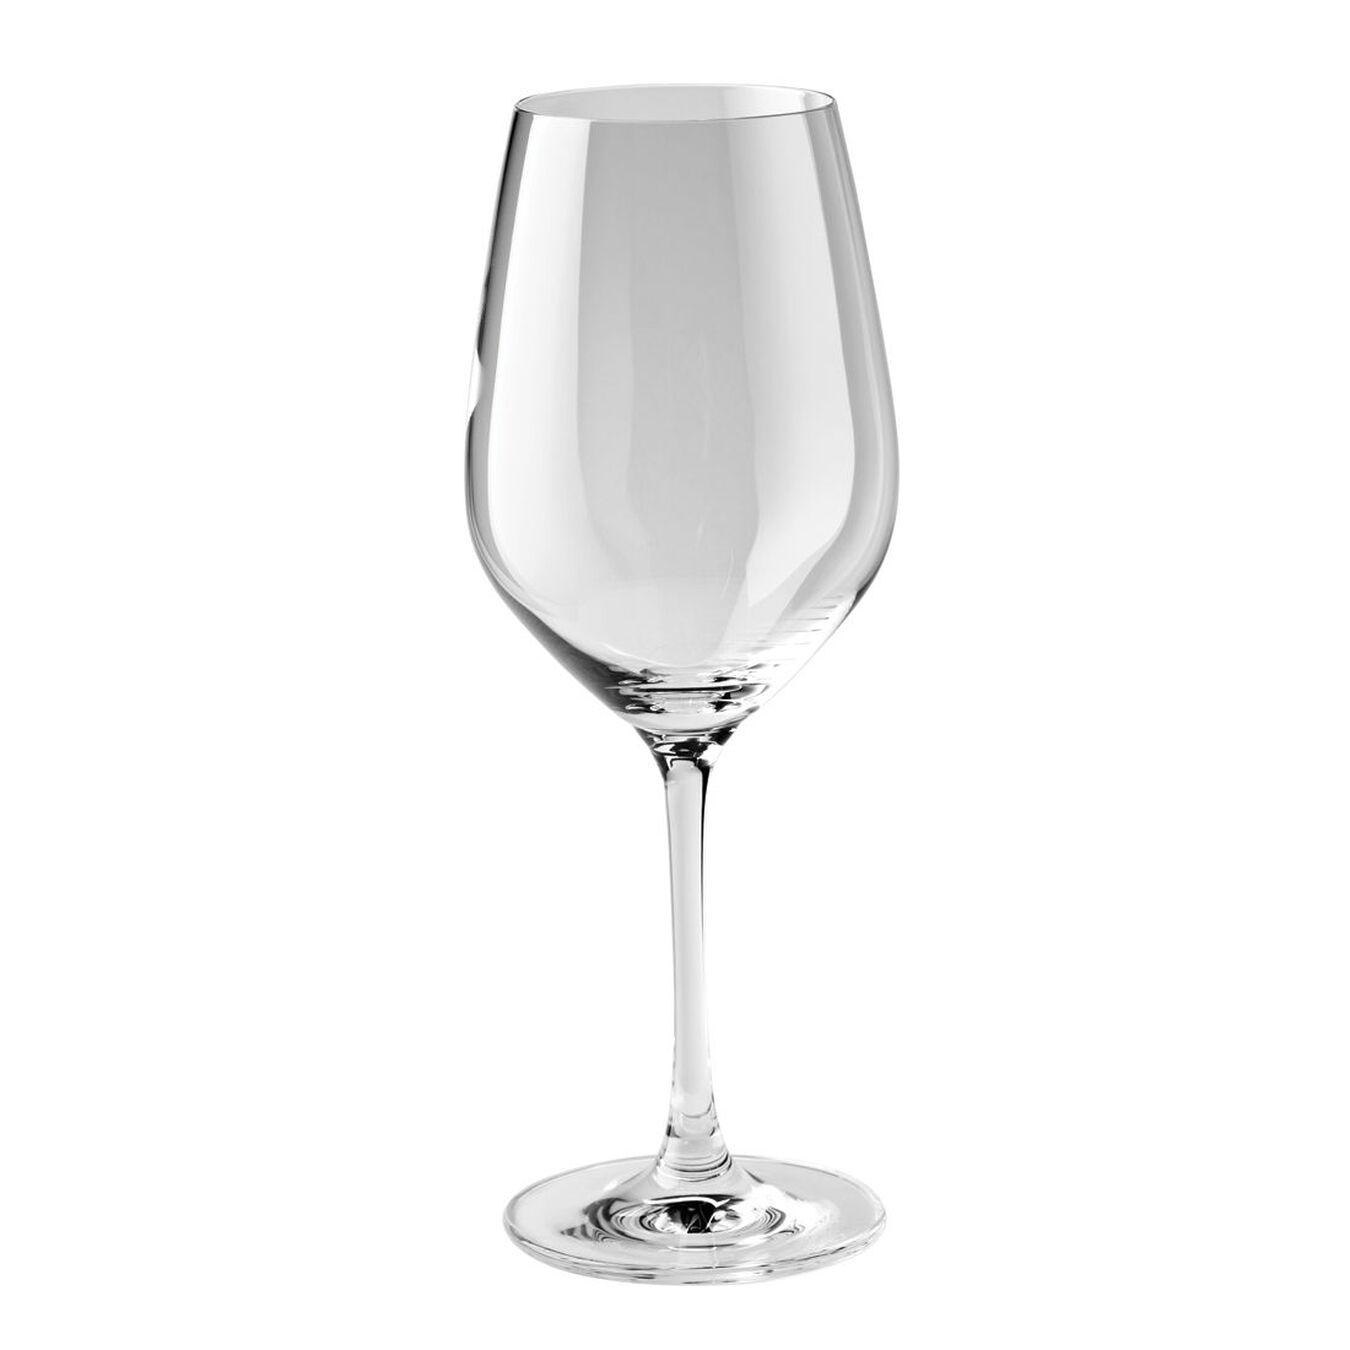 6-pc Burgundy White Glass Set,,large 1